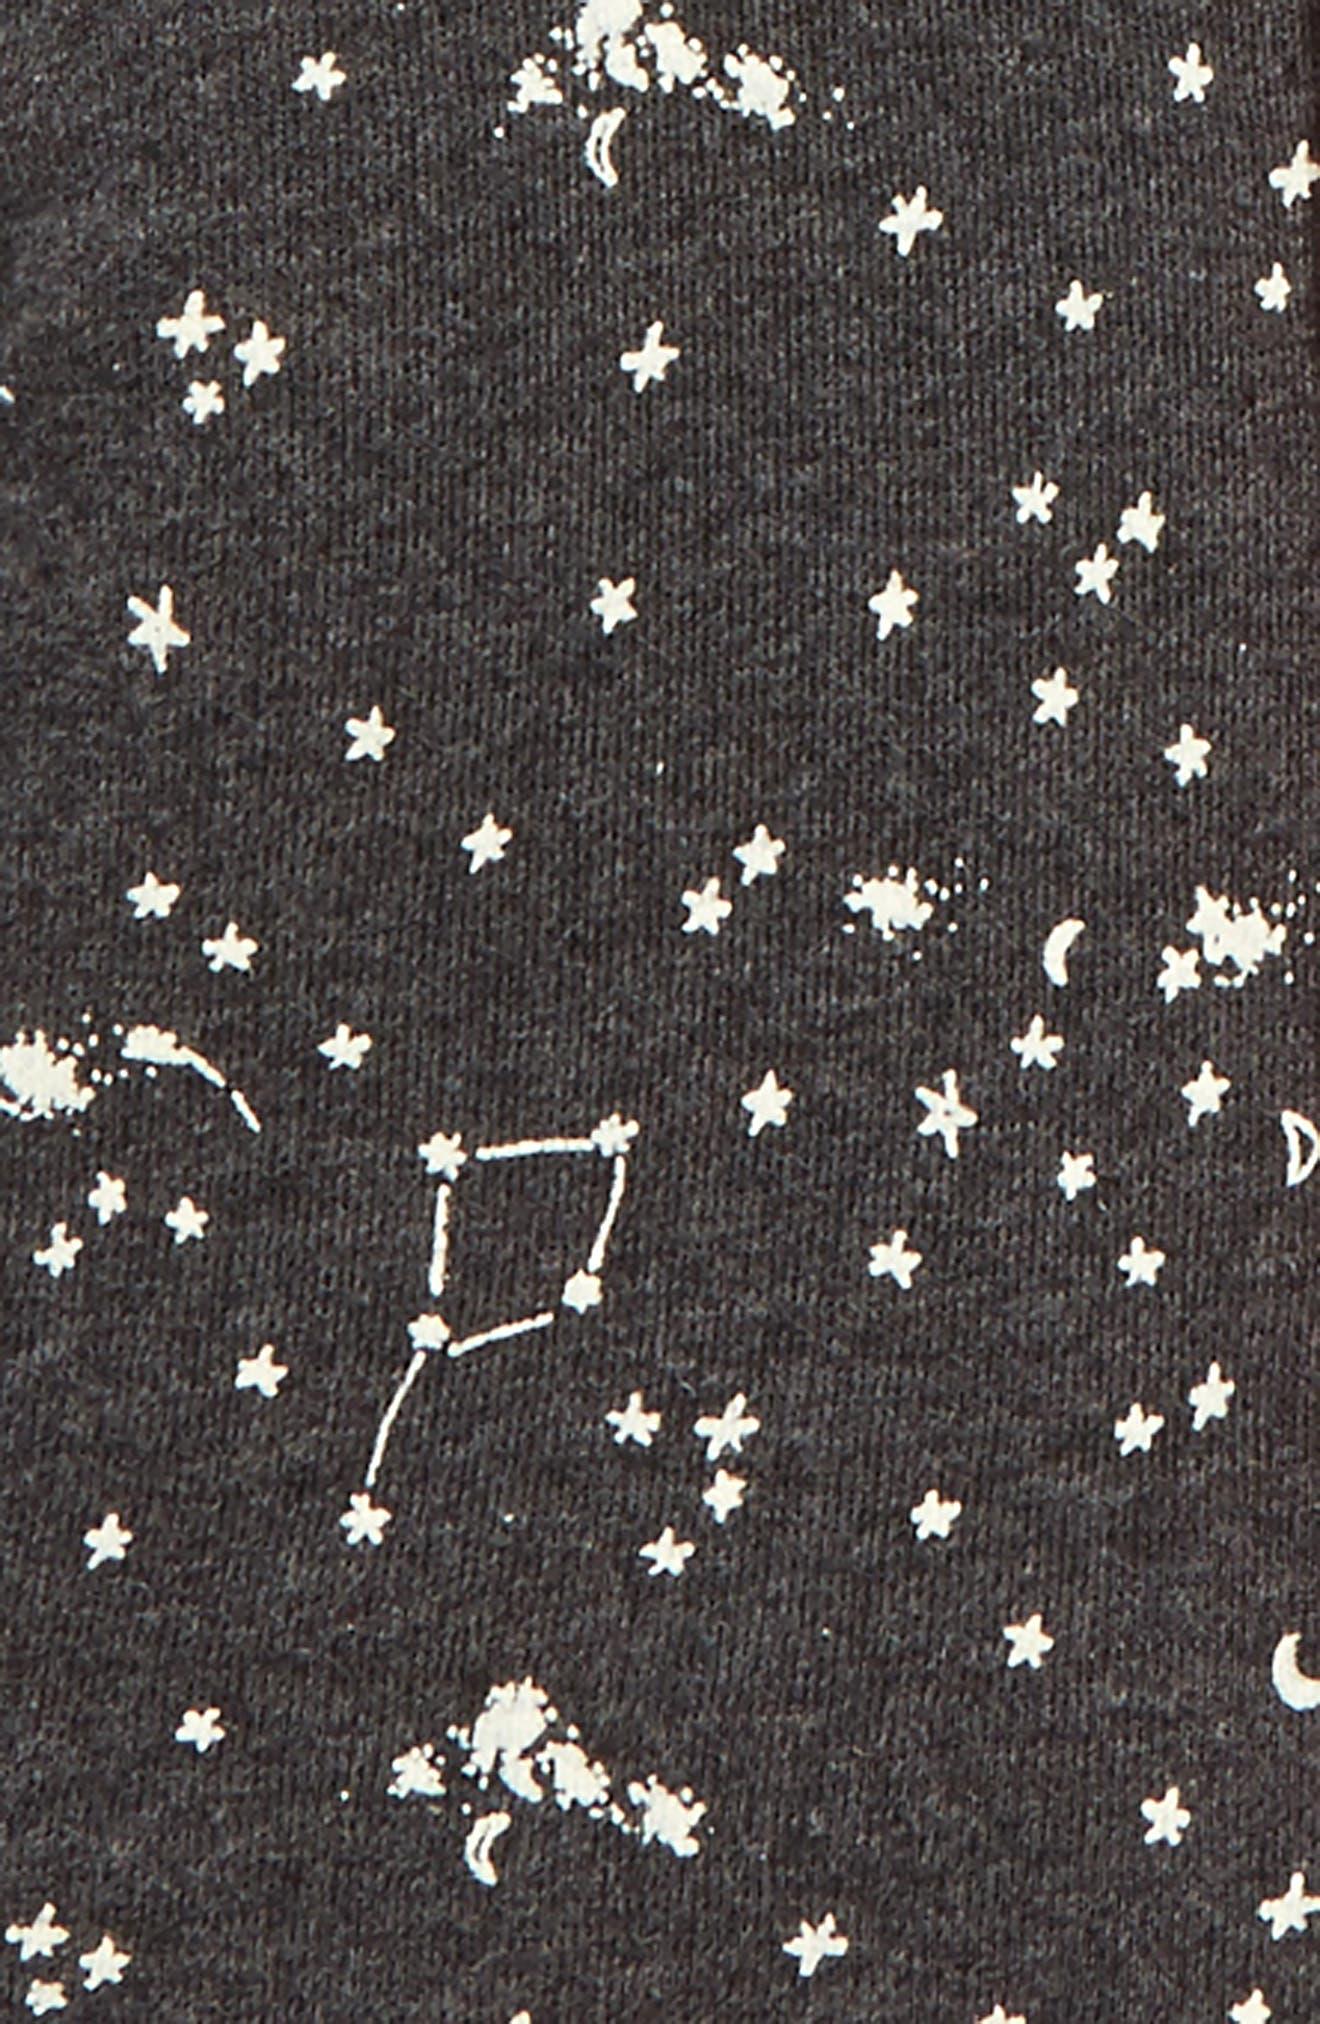 Burt's Bees Reversible Organic Cotton Hoodie,                             Alternate thumbnail 3, color,                             021